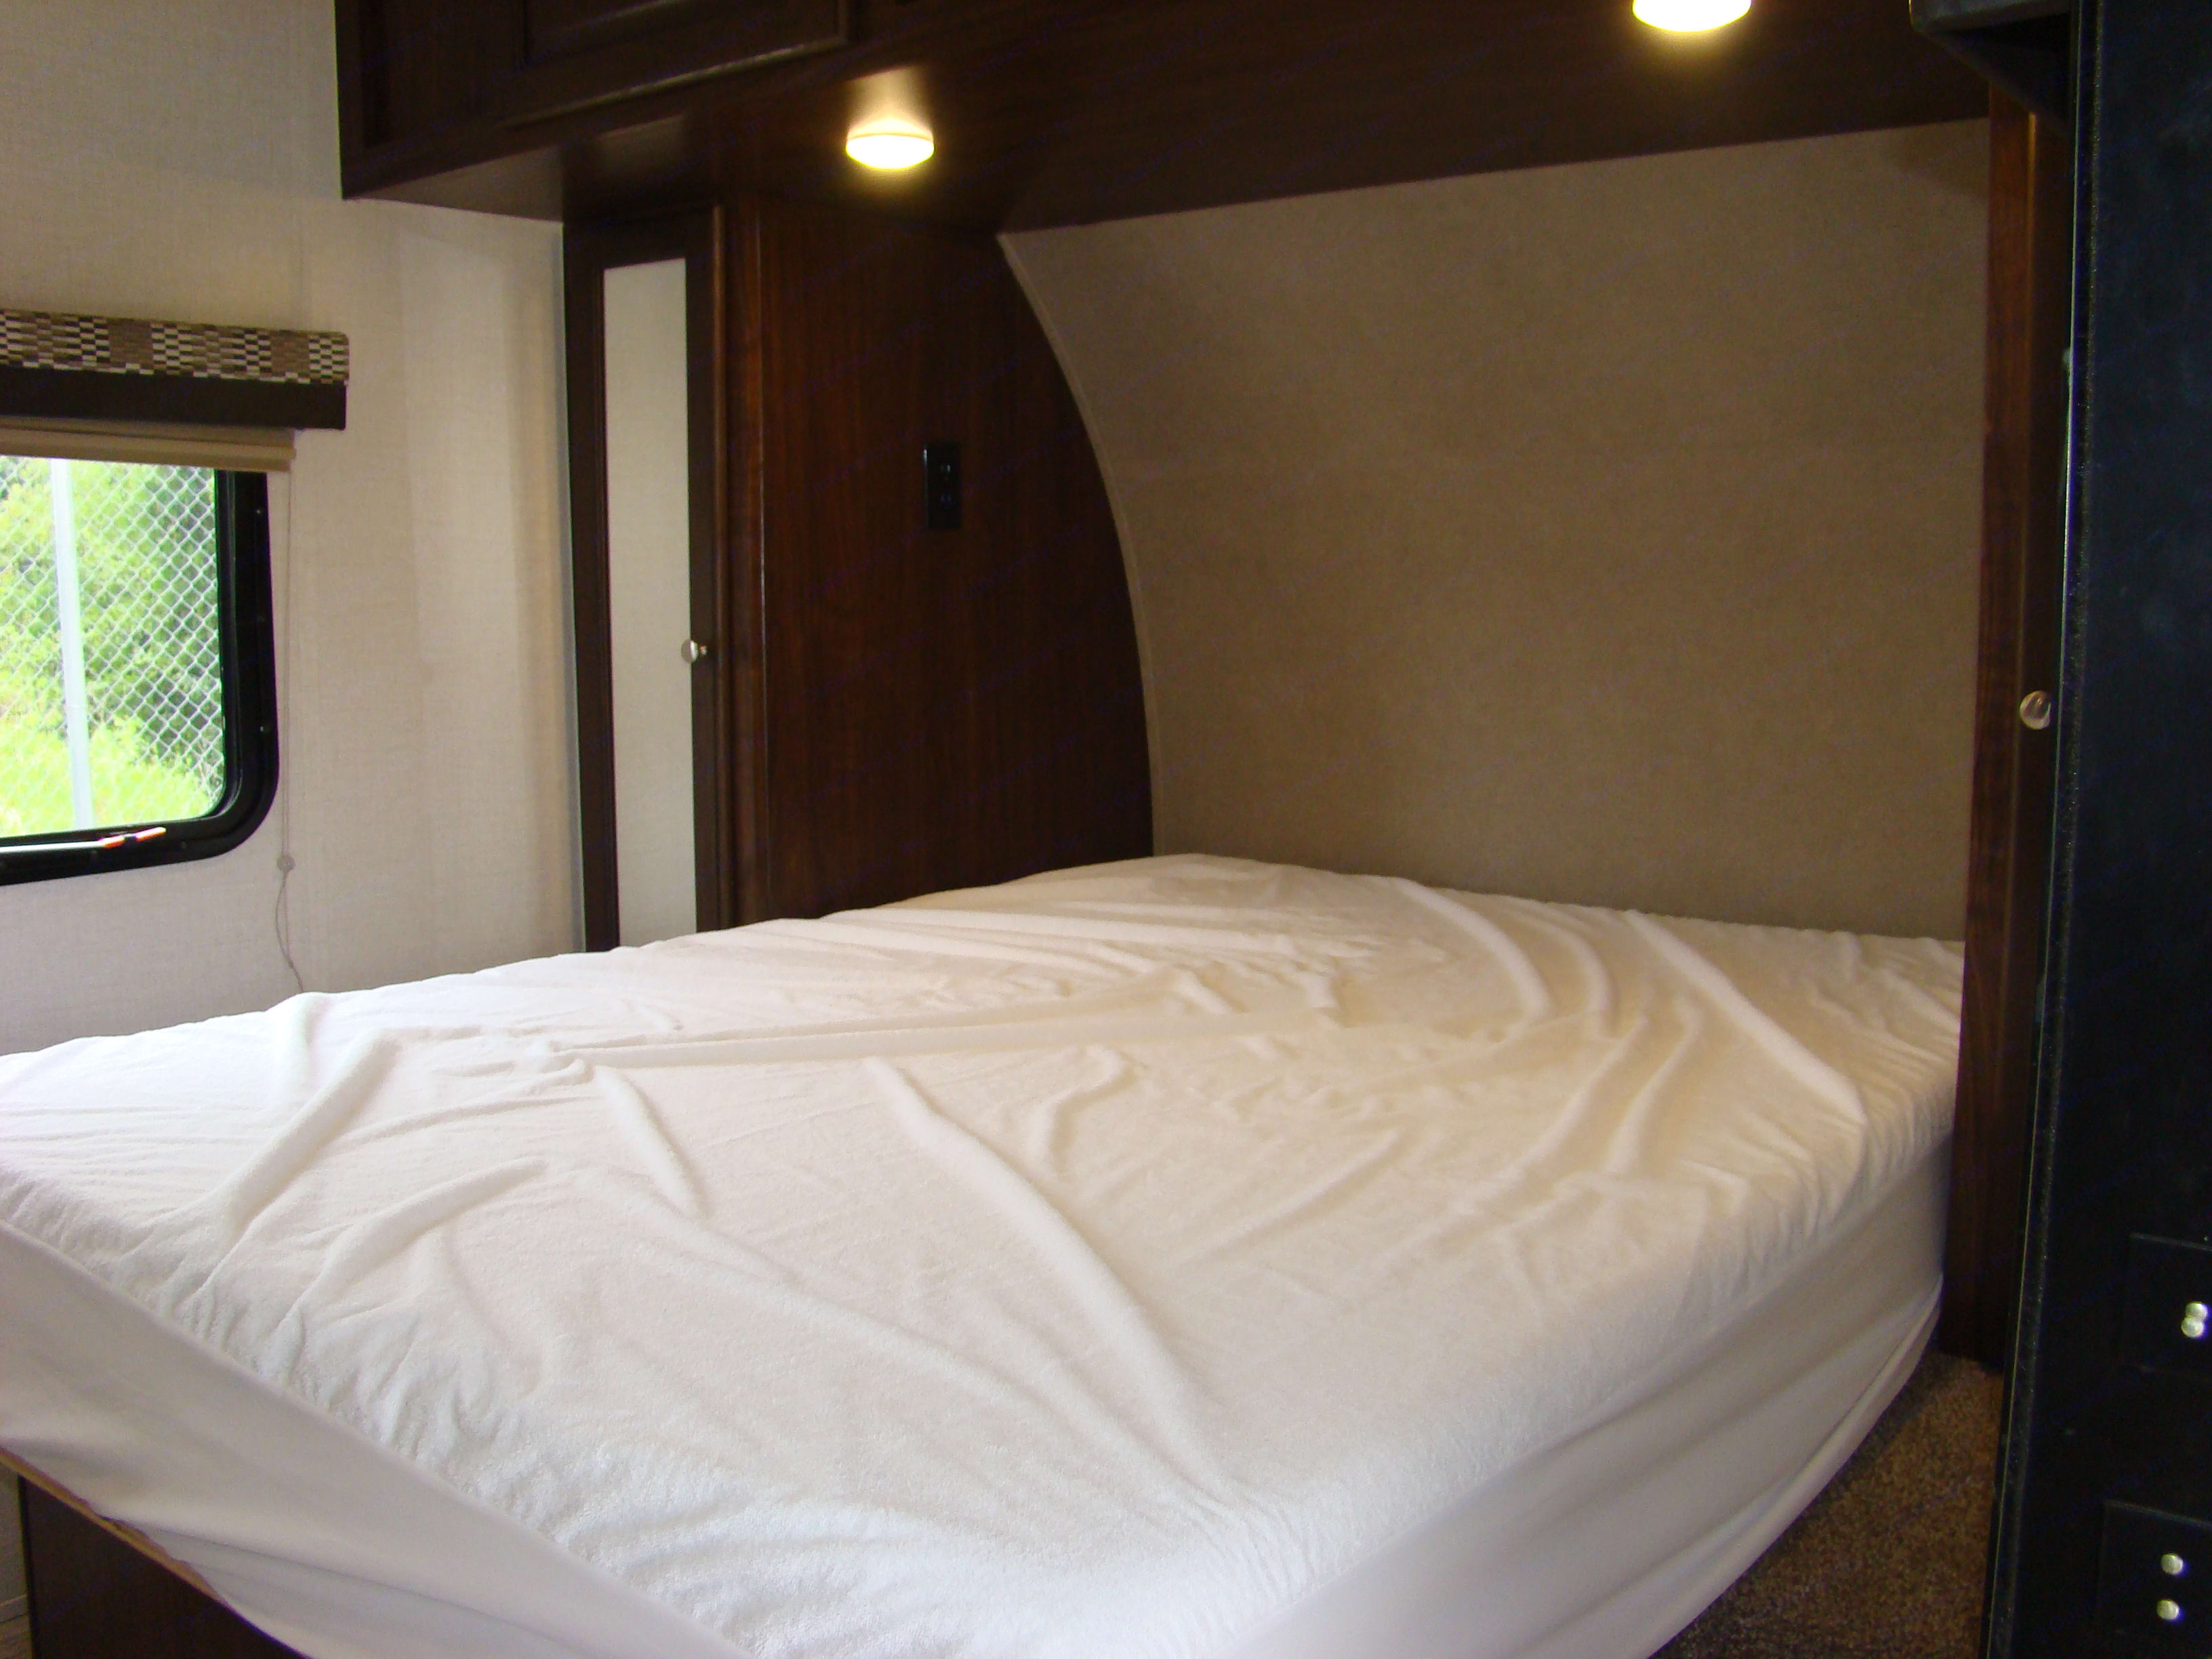 Comfortable full size bed. Palomino Palomini 180FB 2019